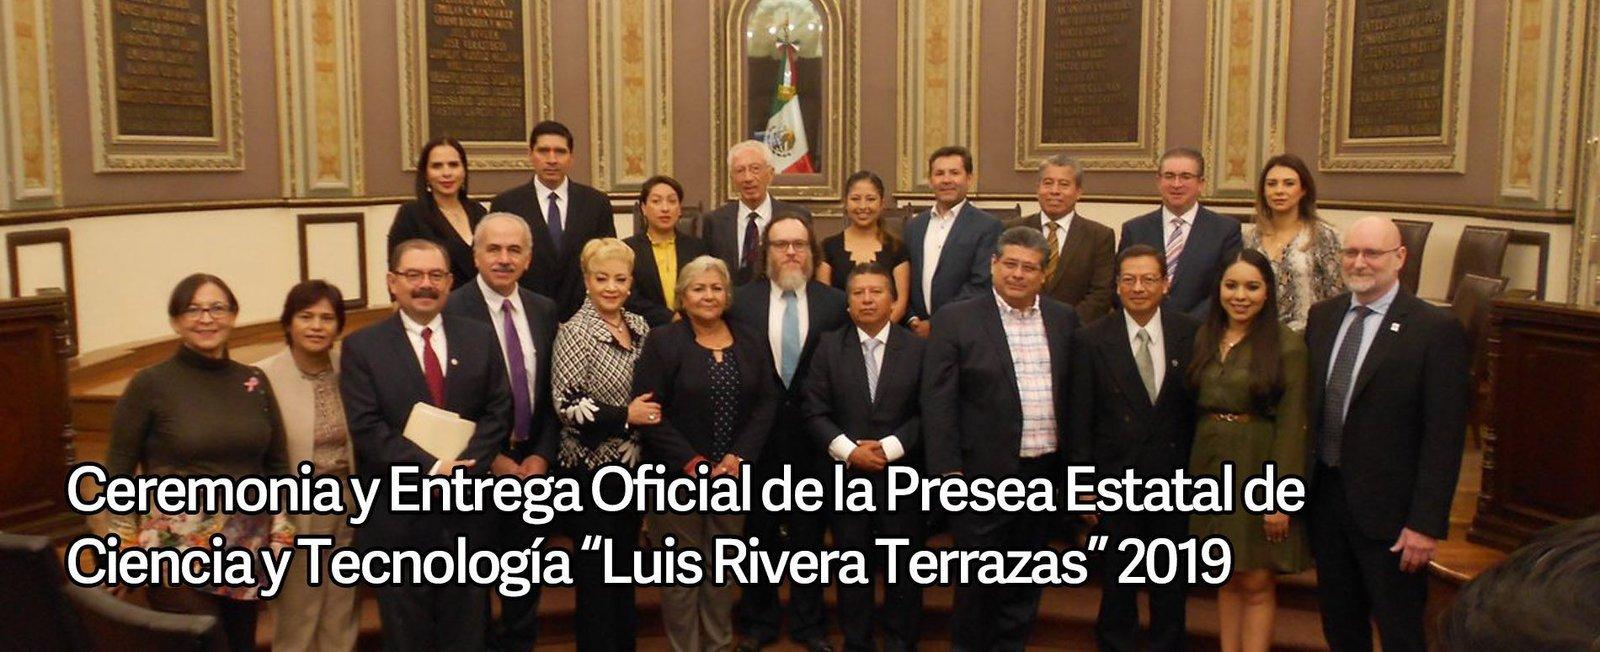 banner_ceremonia_presea